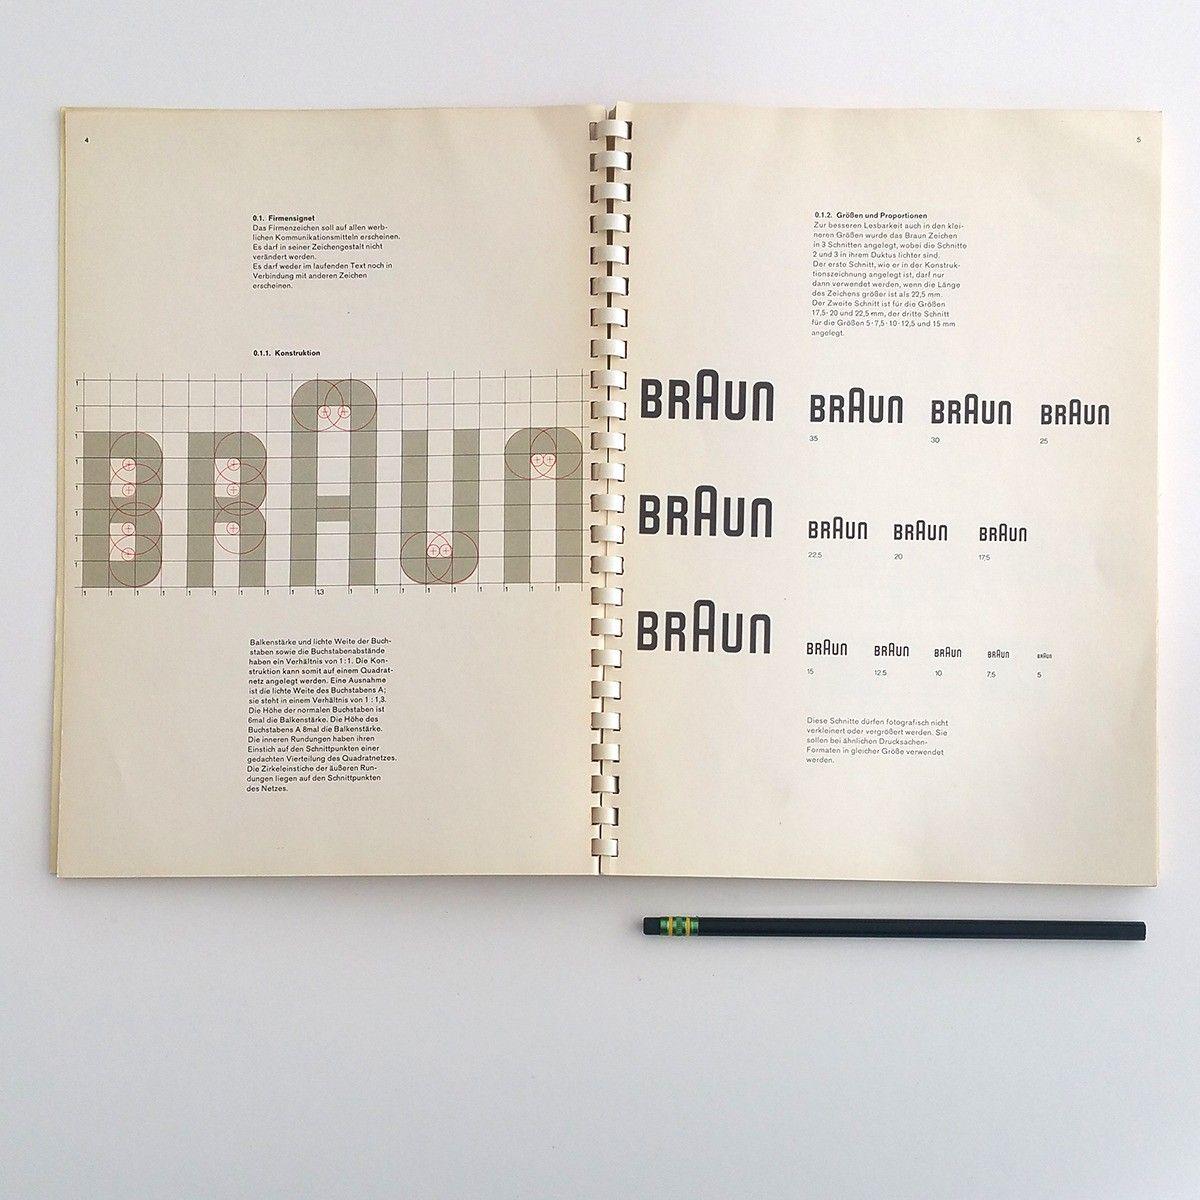 Braun manual from Vignelli Center